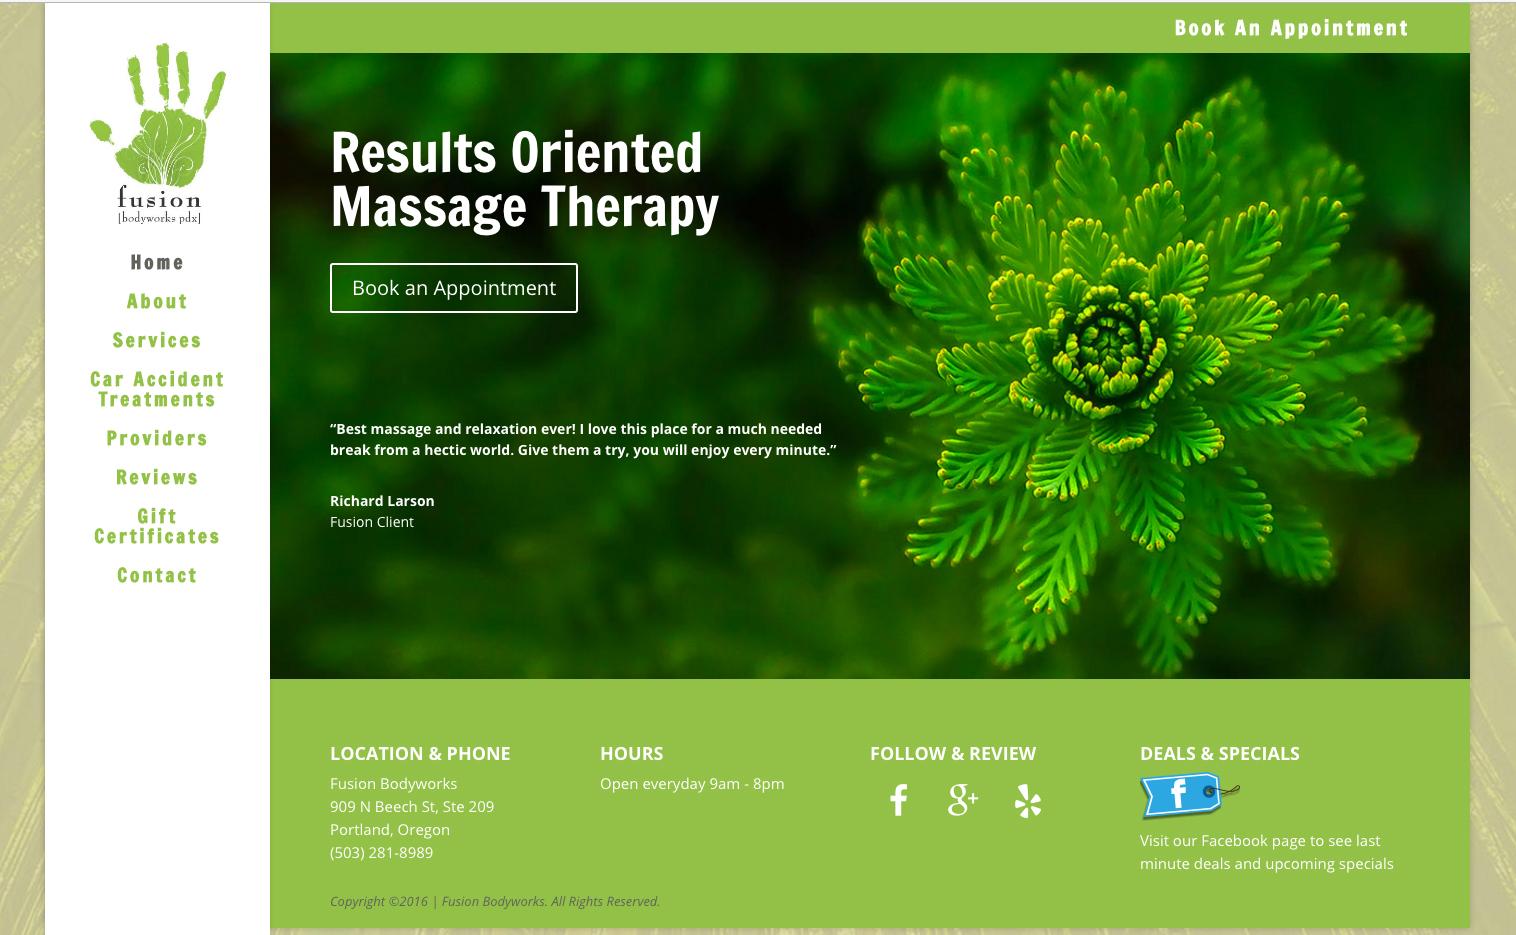 fusionpdx-website